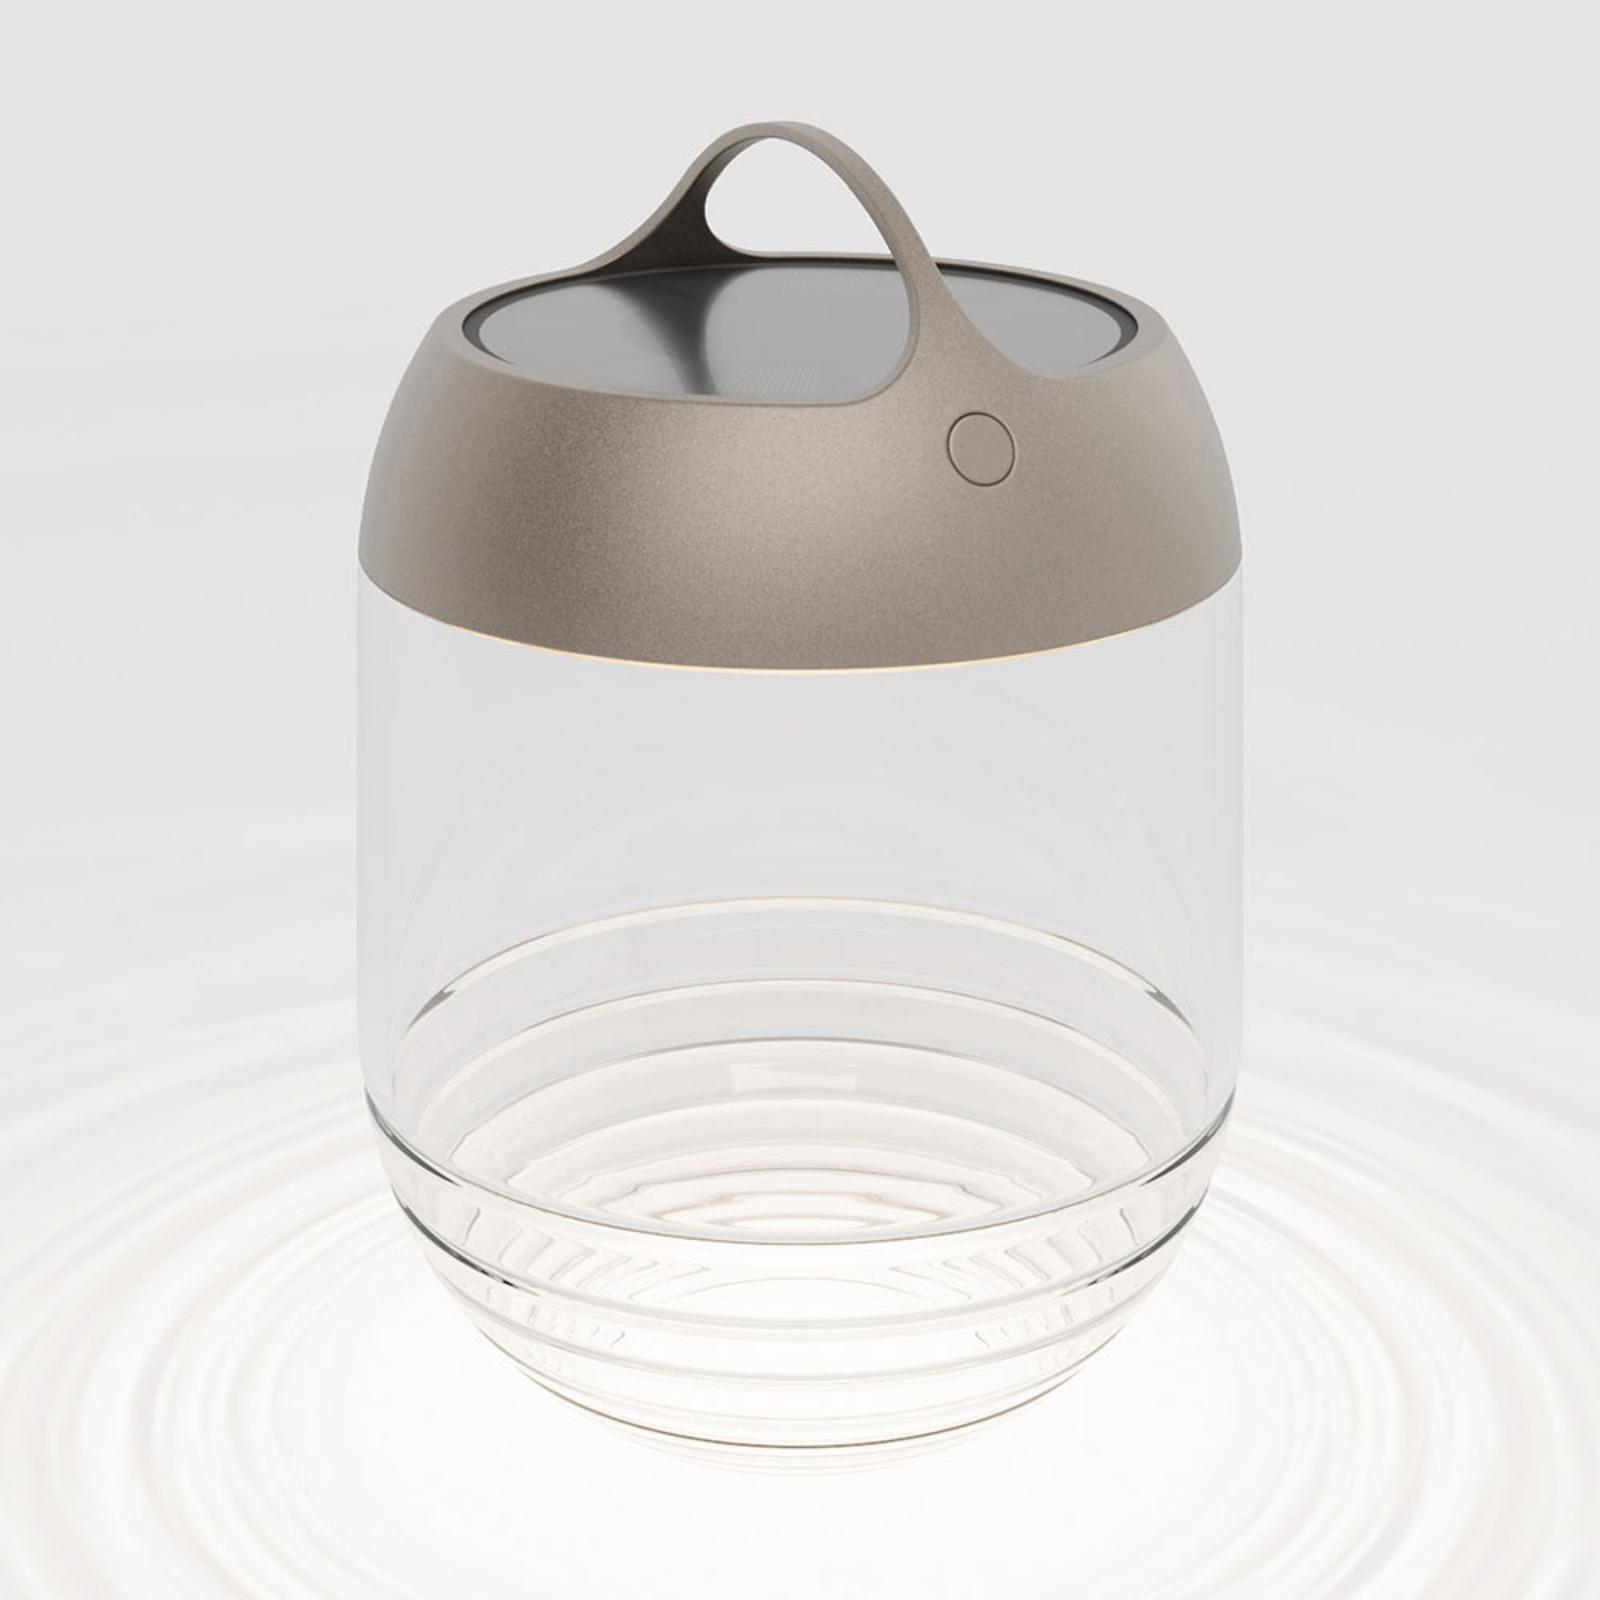 IP44.de aqu M lampa solarna LED, 35 cm brązowa